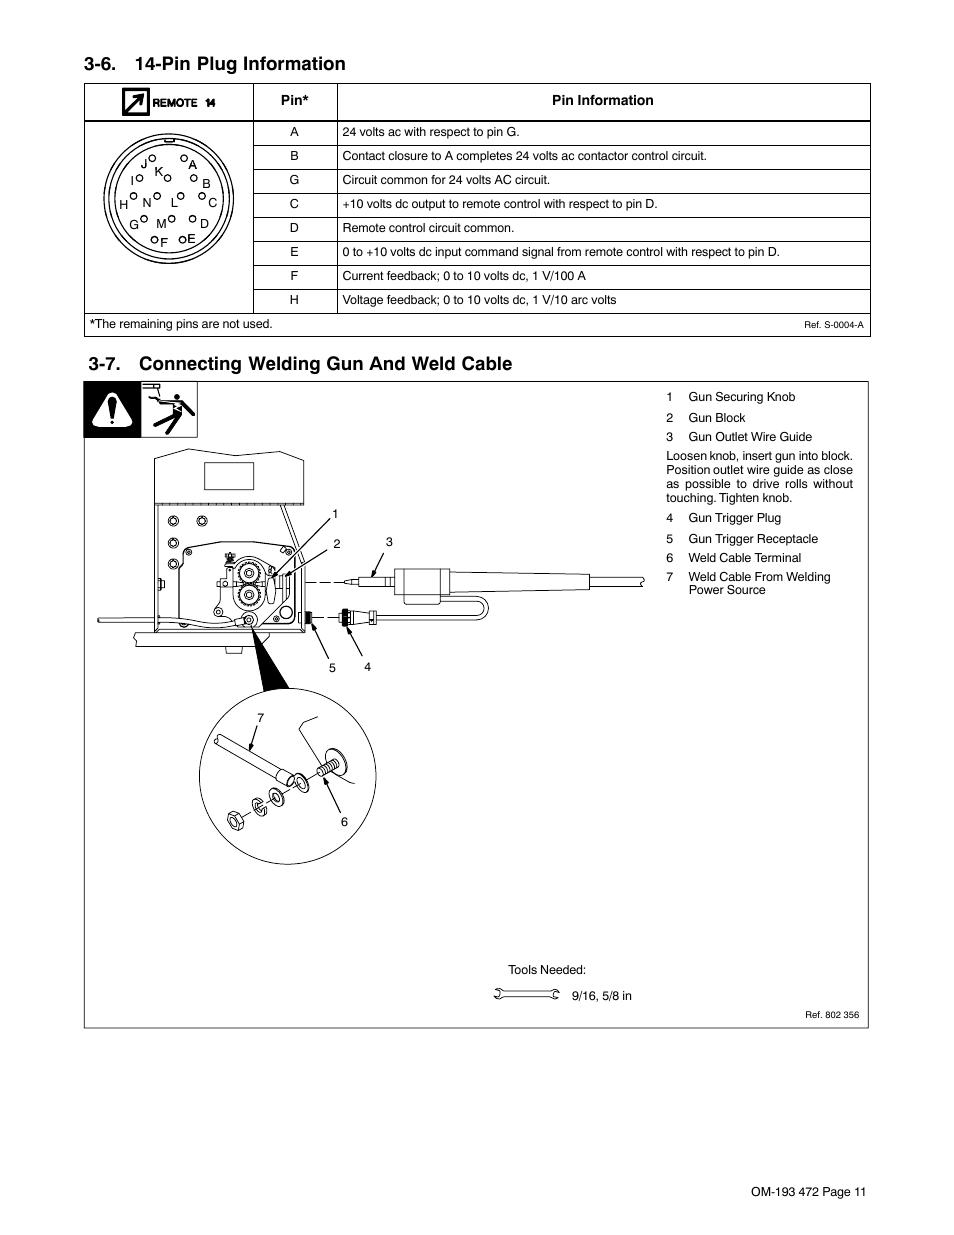 Miller 14 Pin Wiring Diagram - wiring diagram on the net on